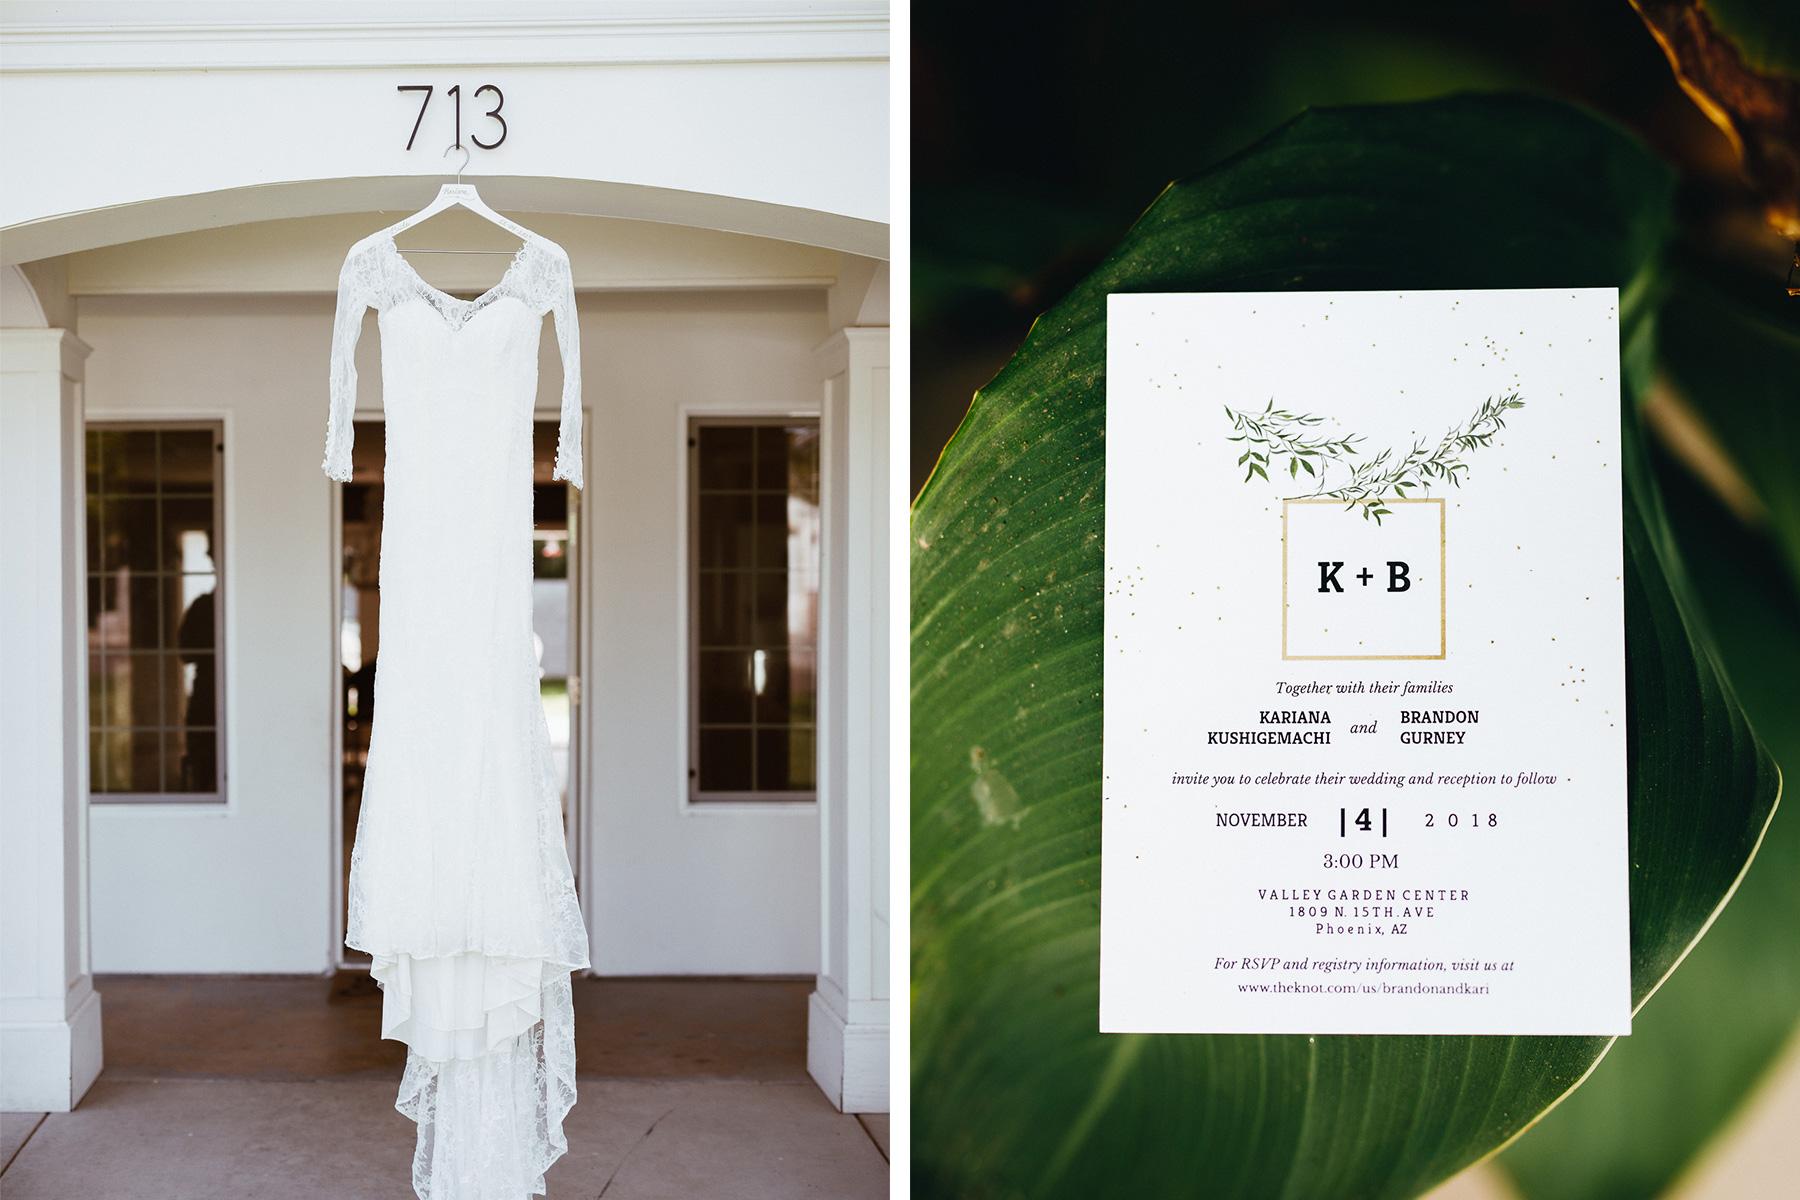 181104-Luxium-Weddings-Arizona-@matt__Le-Brandon-Kariana-Phoenix-Valley-Garden-Center-1003a.jpg